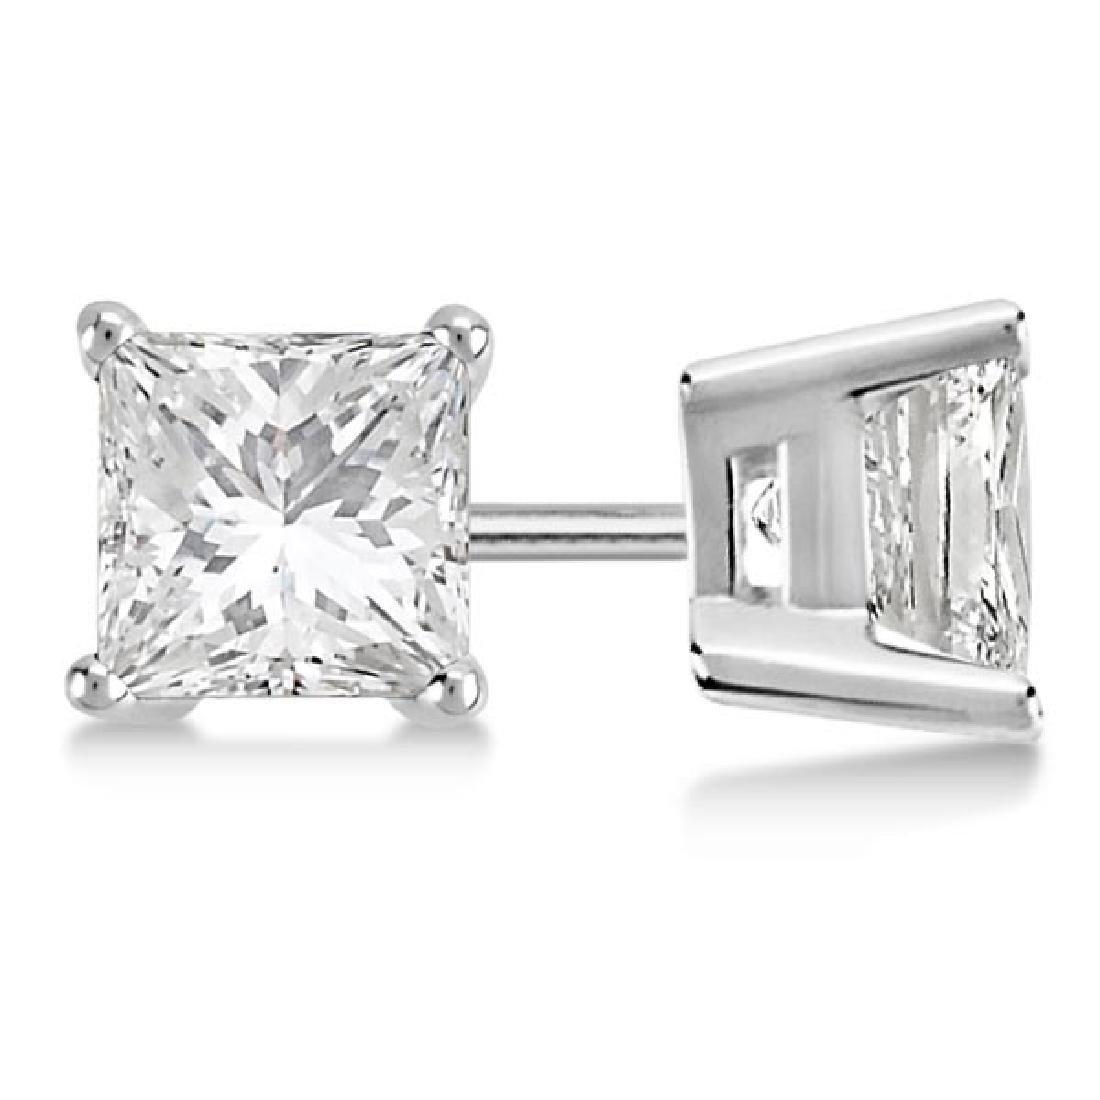 Certified 1 CTW Princess Diamond Stud Earrings E/SI2